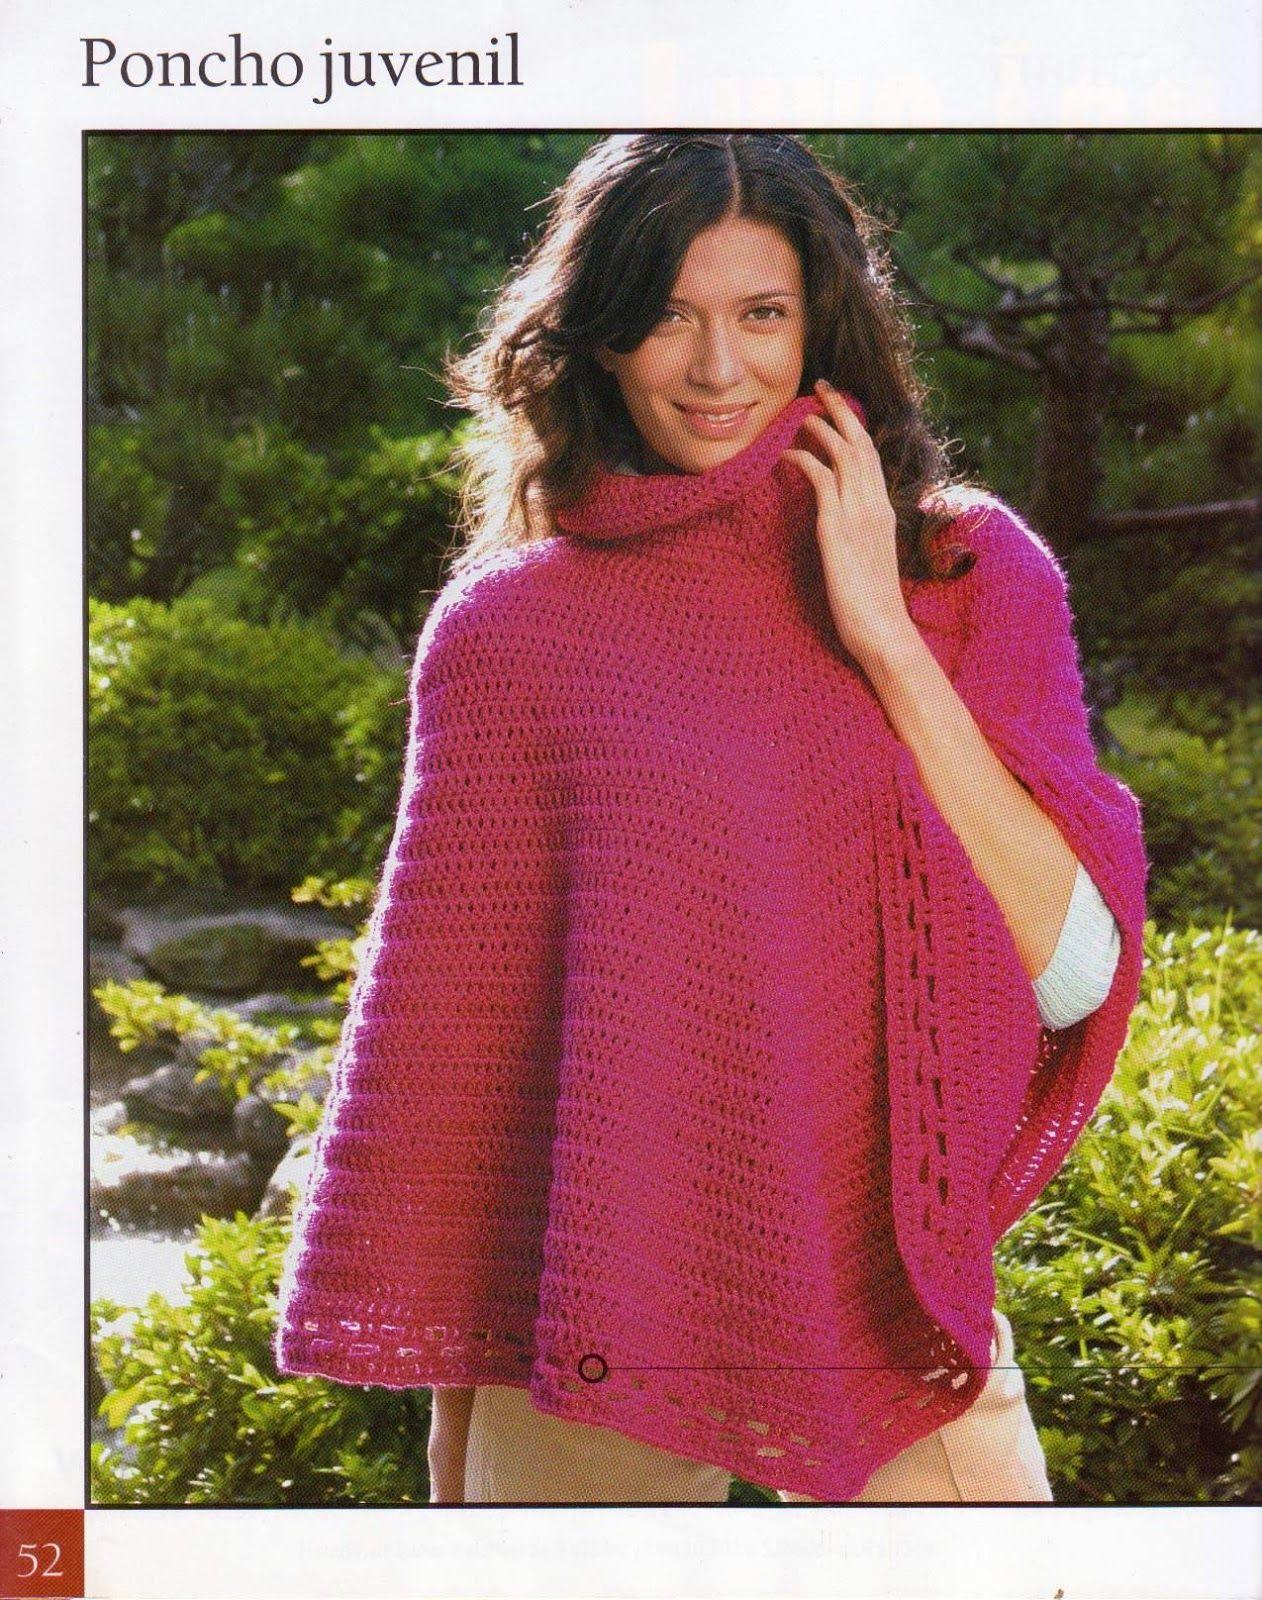 Poncho juvenil fucsia | Ponchos | Pinterest | Patrones crochet ...